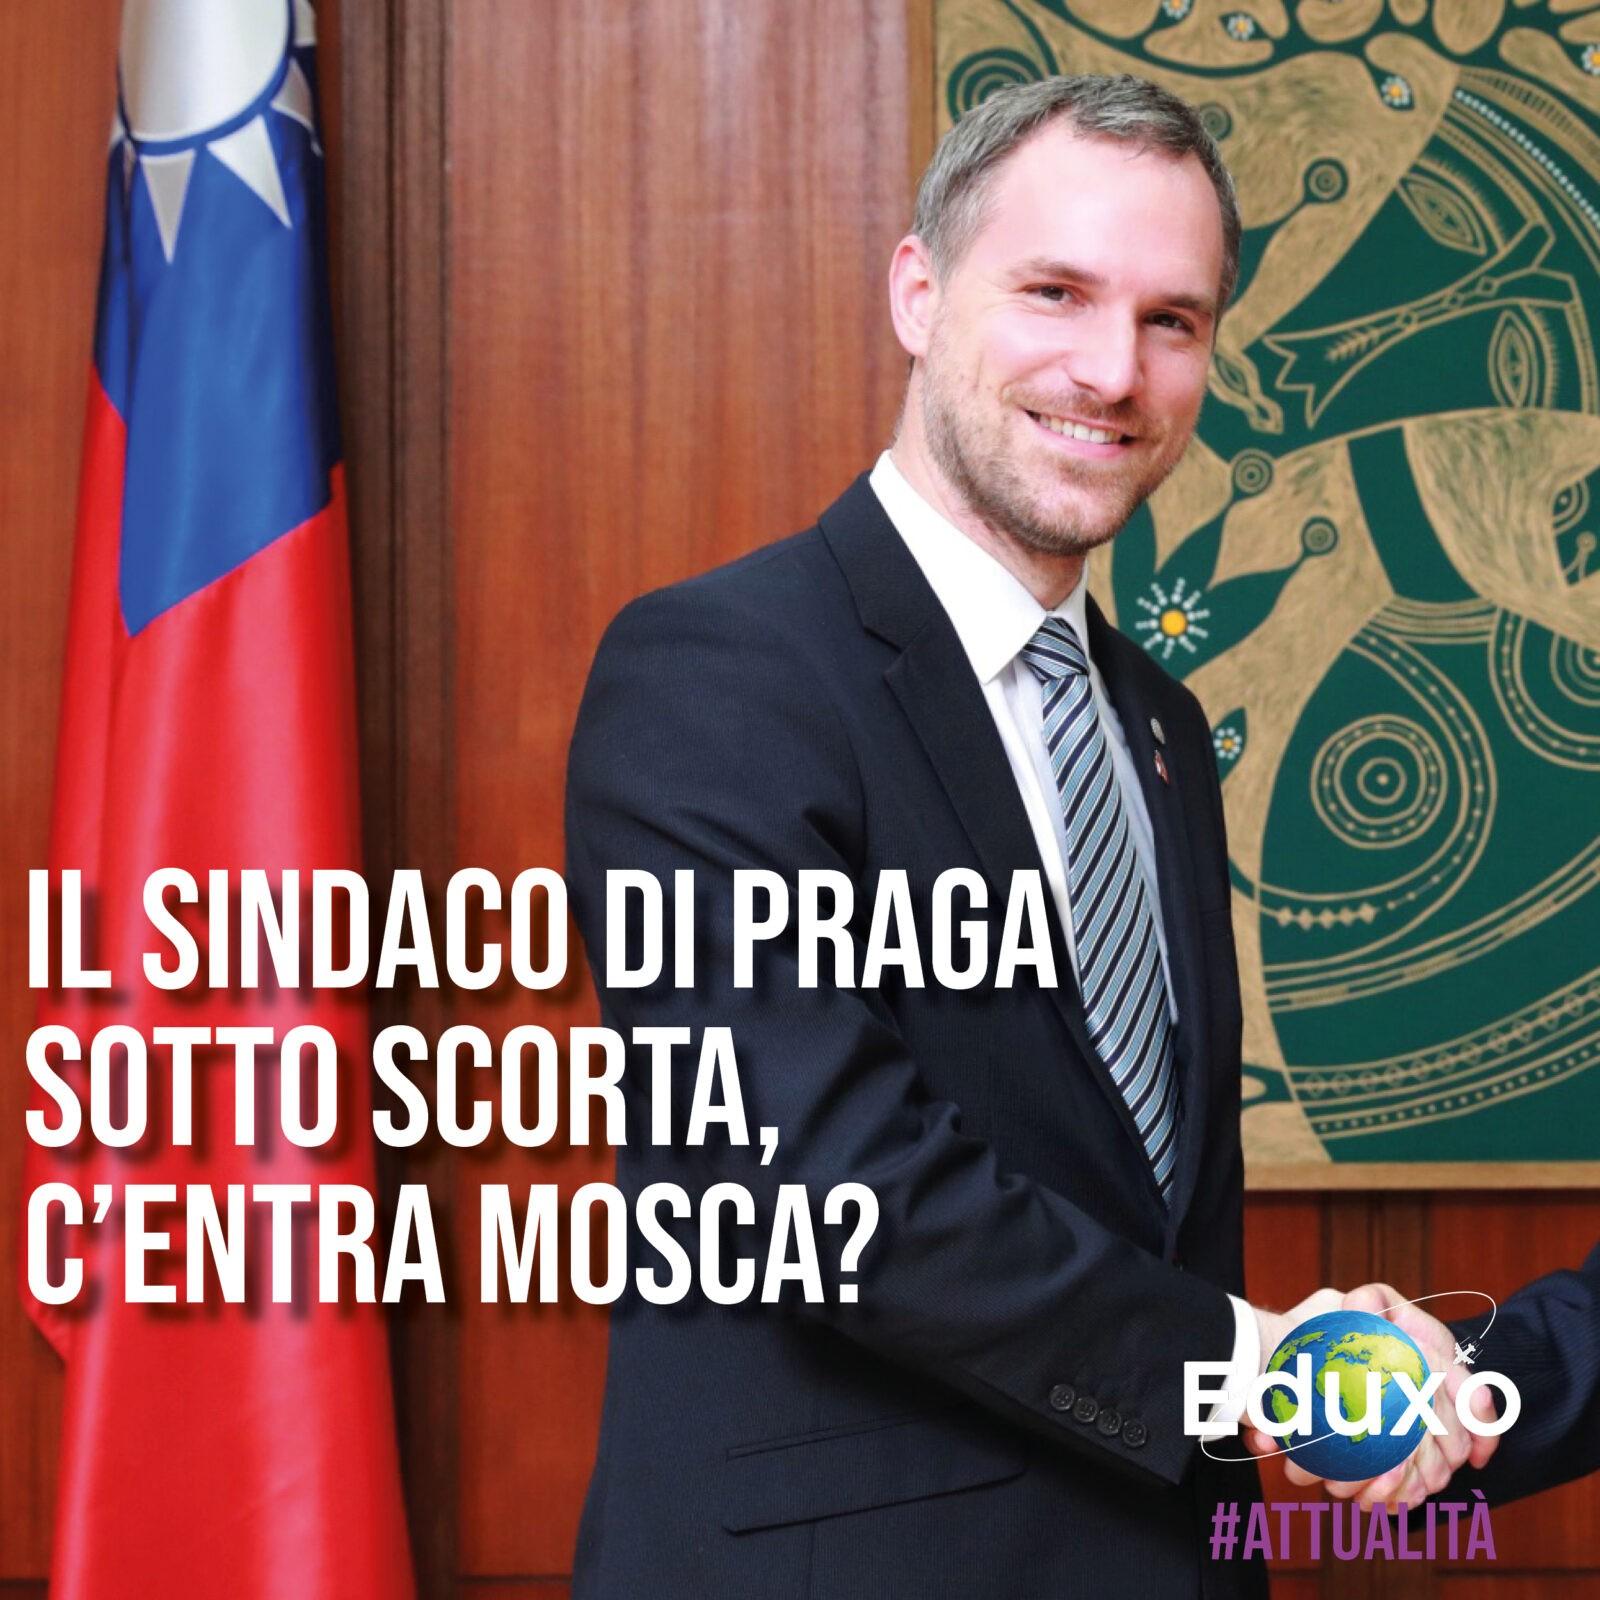 You are currently viewing Il Sindaco di Praga sotto scorta, c'entra Mosca?